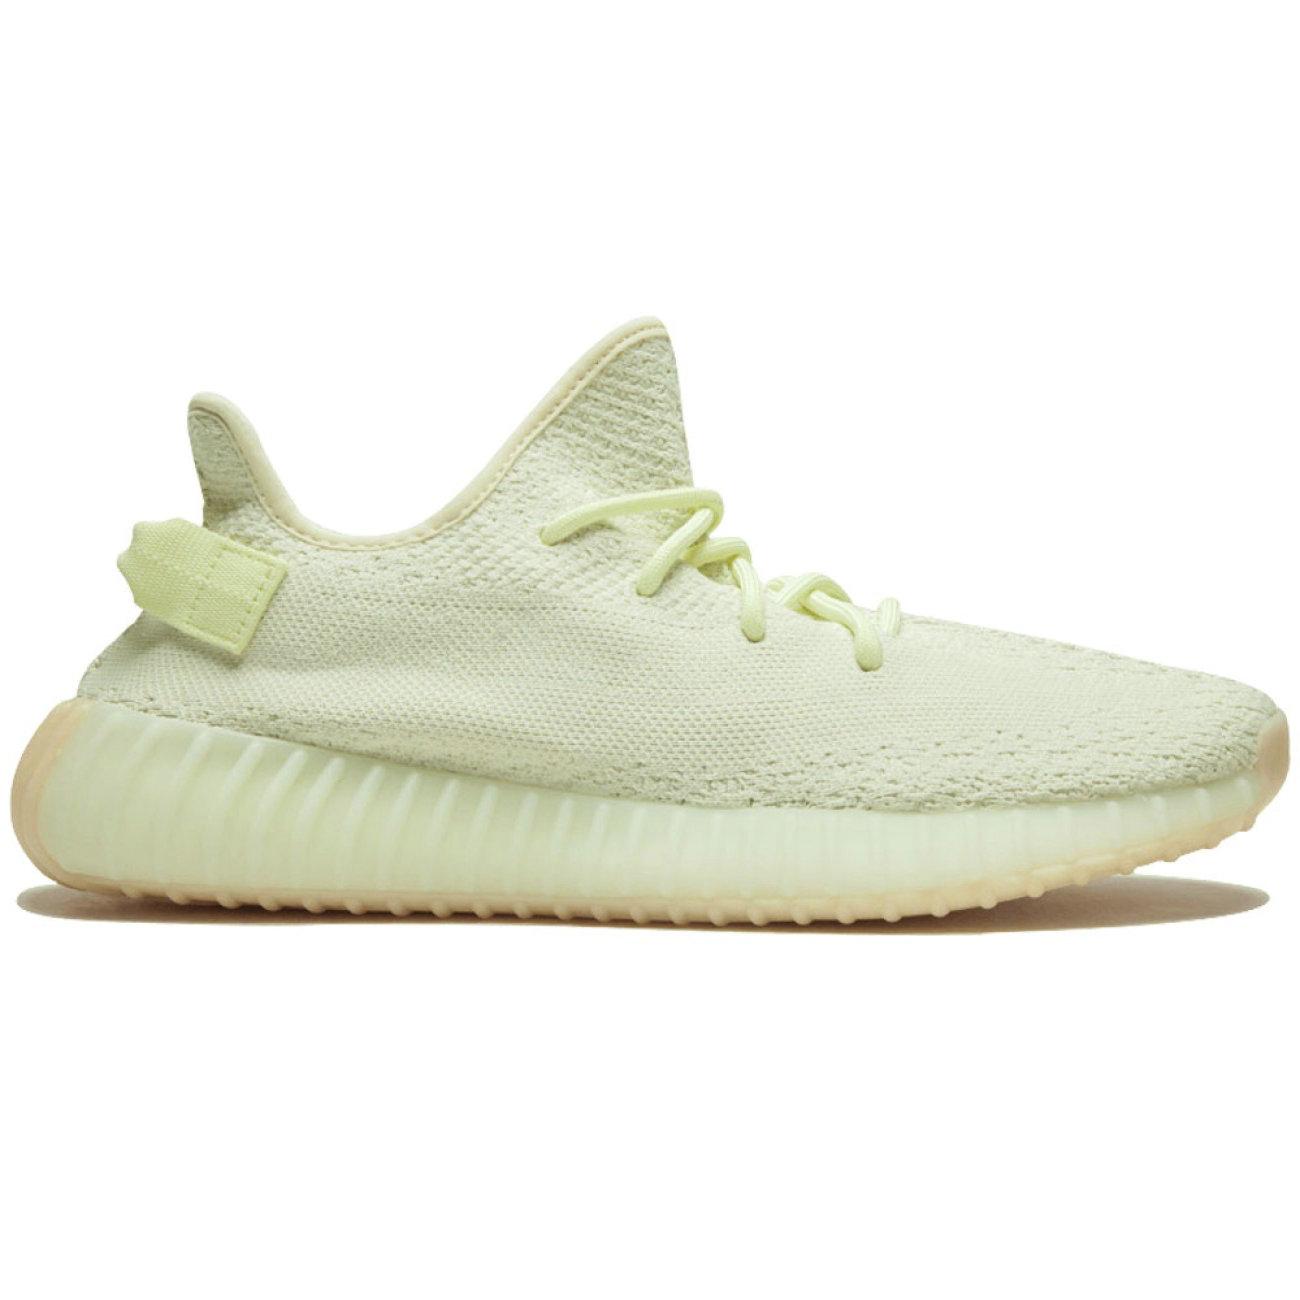 san francisco 8ca77 1a708 Adidas Yeezy Boost 350 V2 Butter